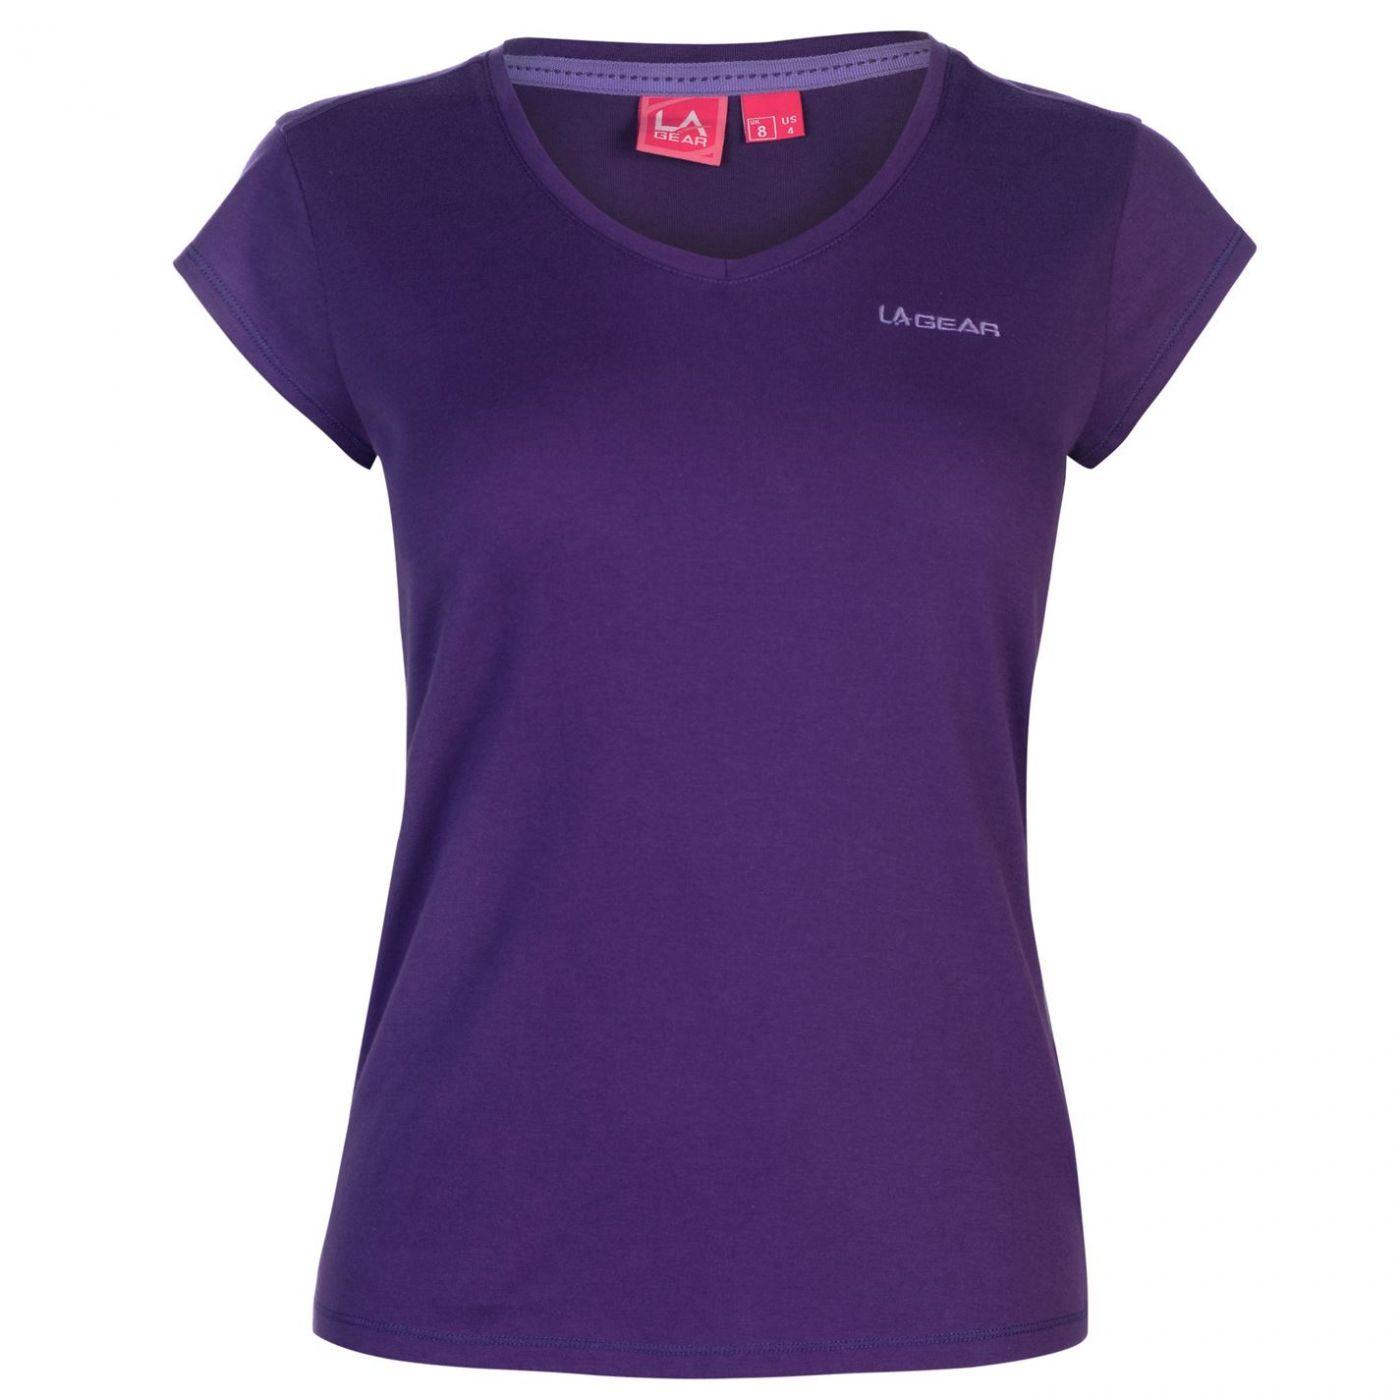 Women's T-shirt LA Gear V neck